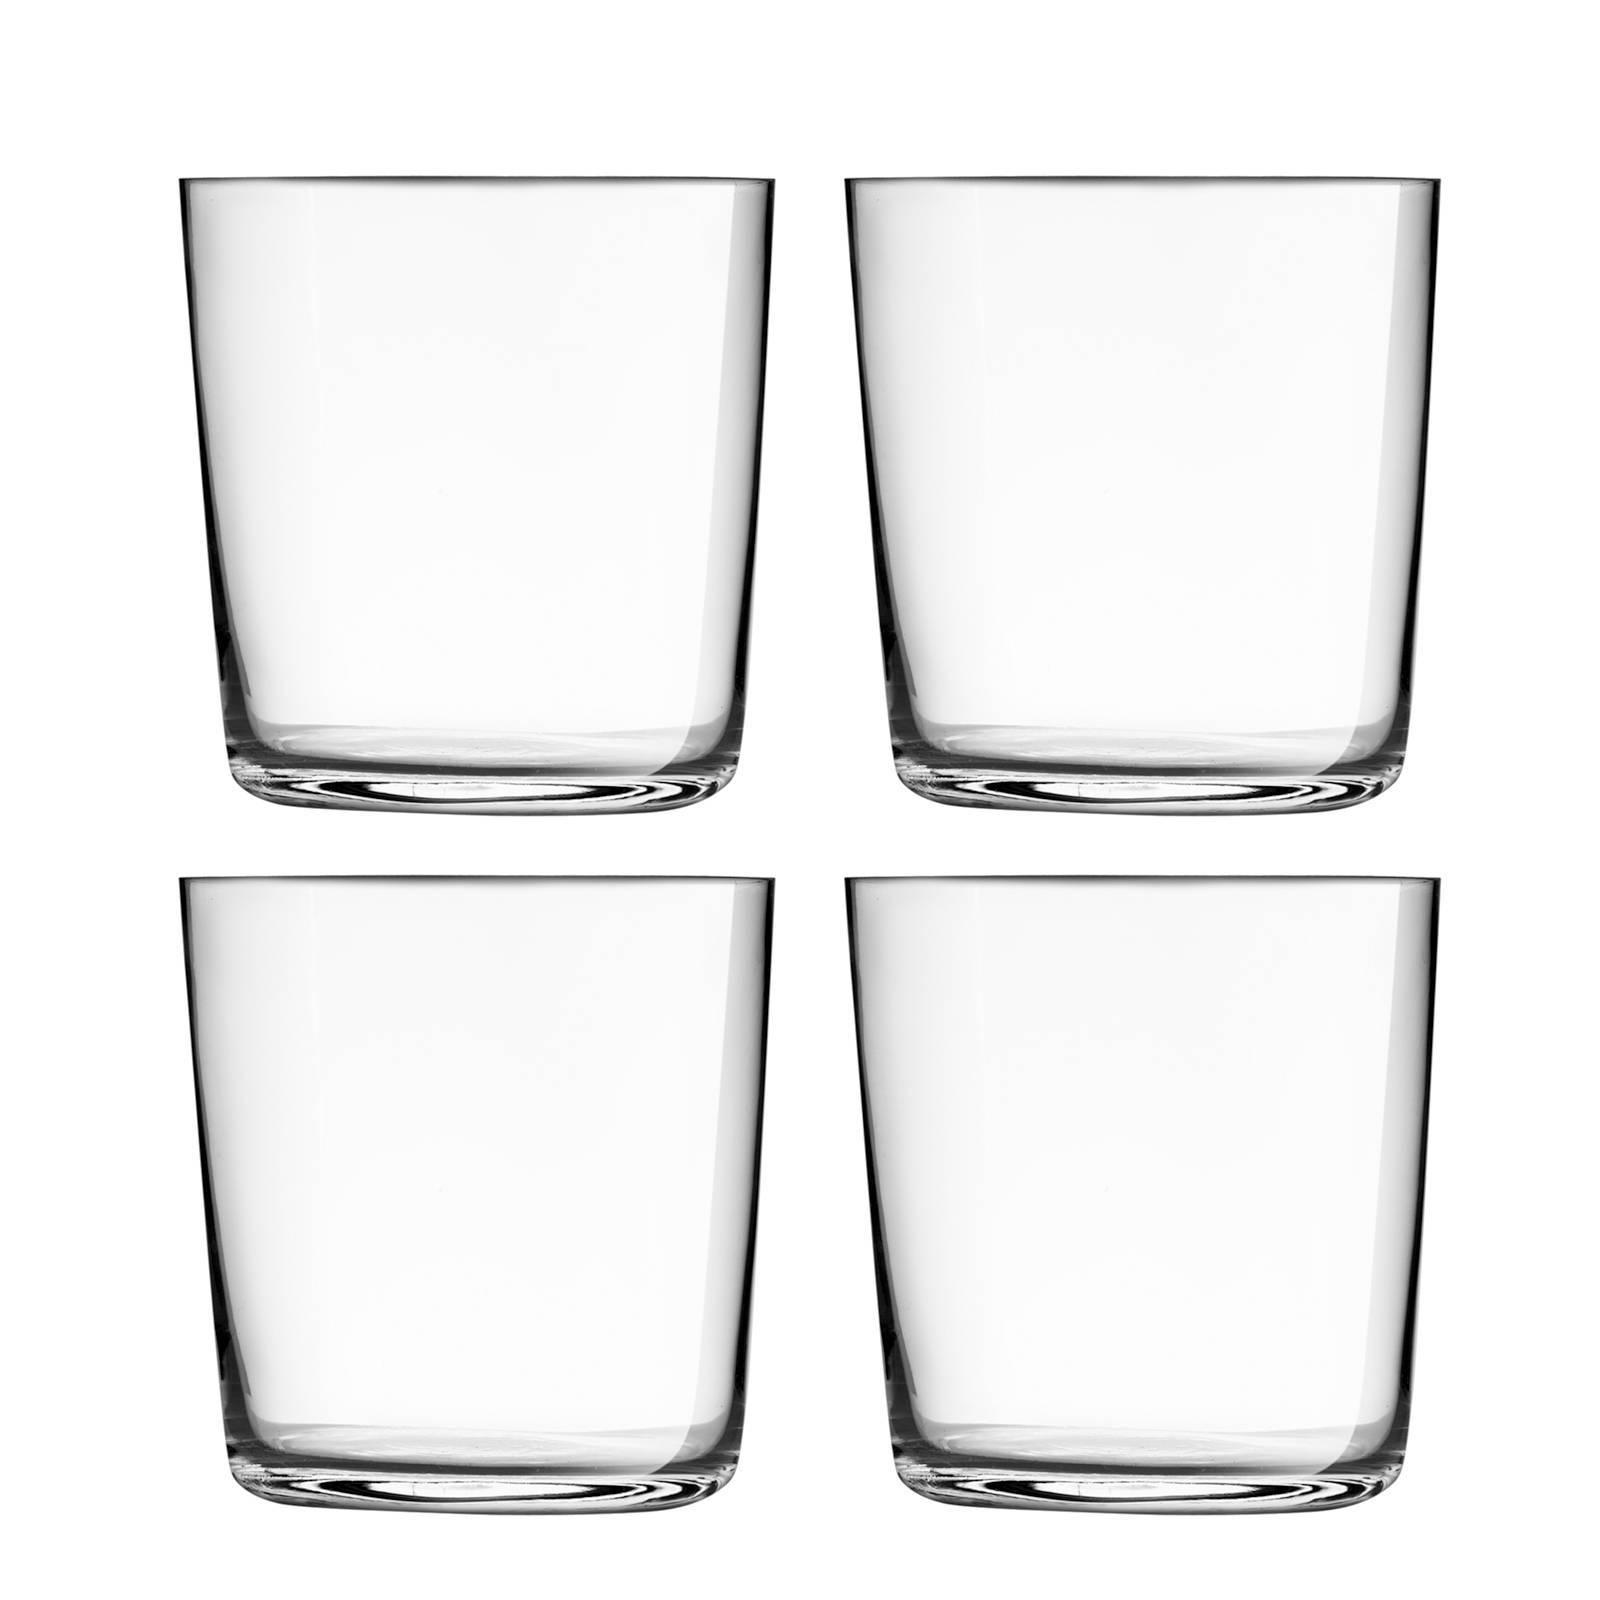 Libbey Cidra waterglas (Ø8,7 cm) (set van 4)